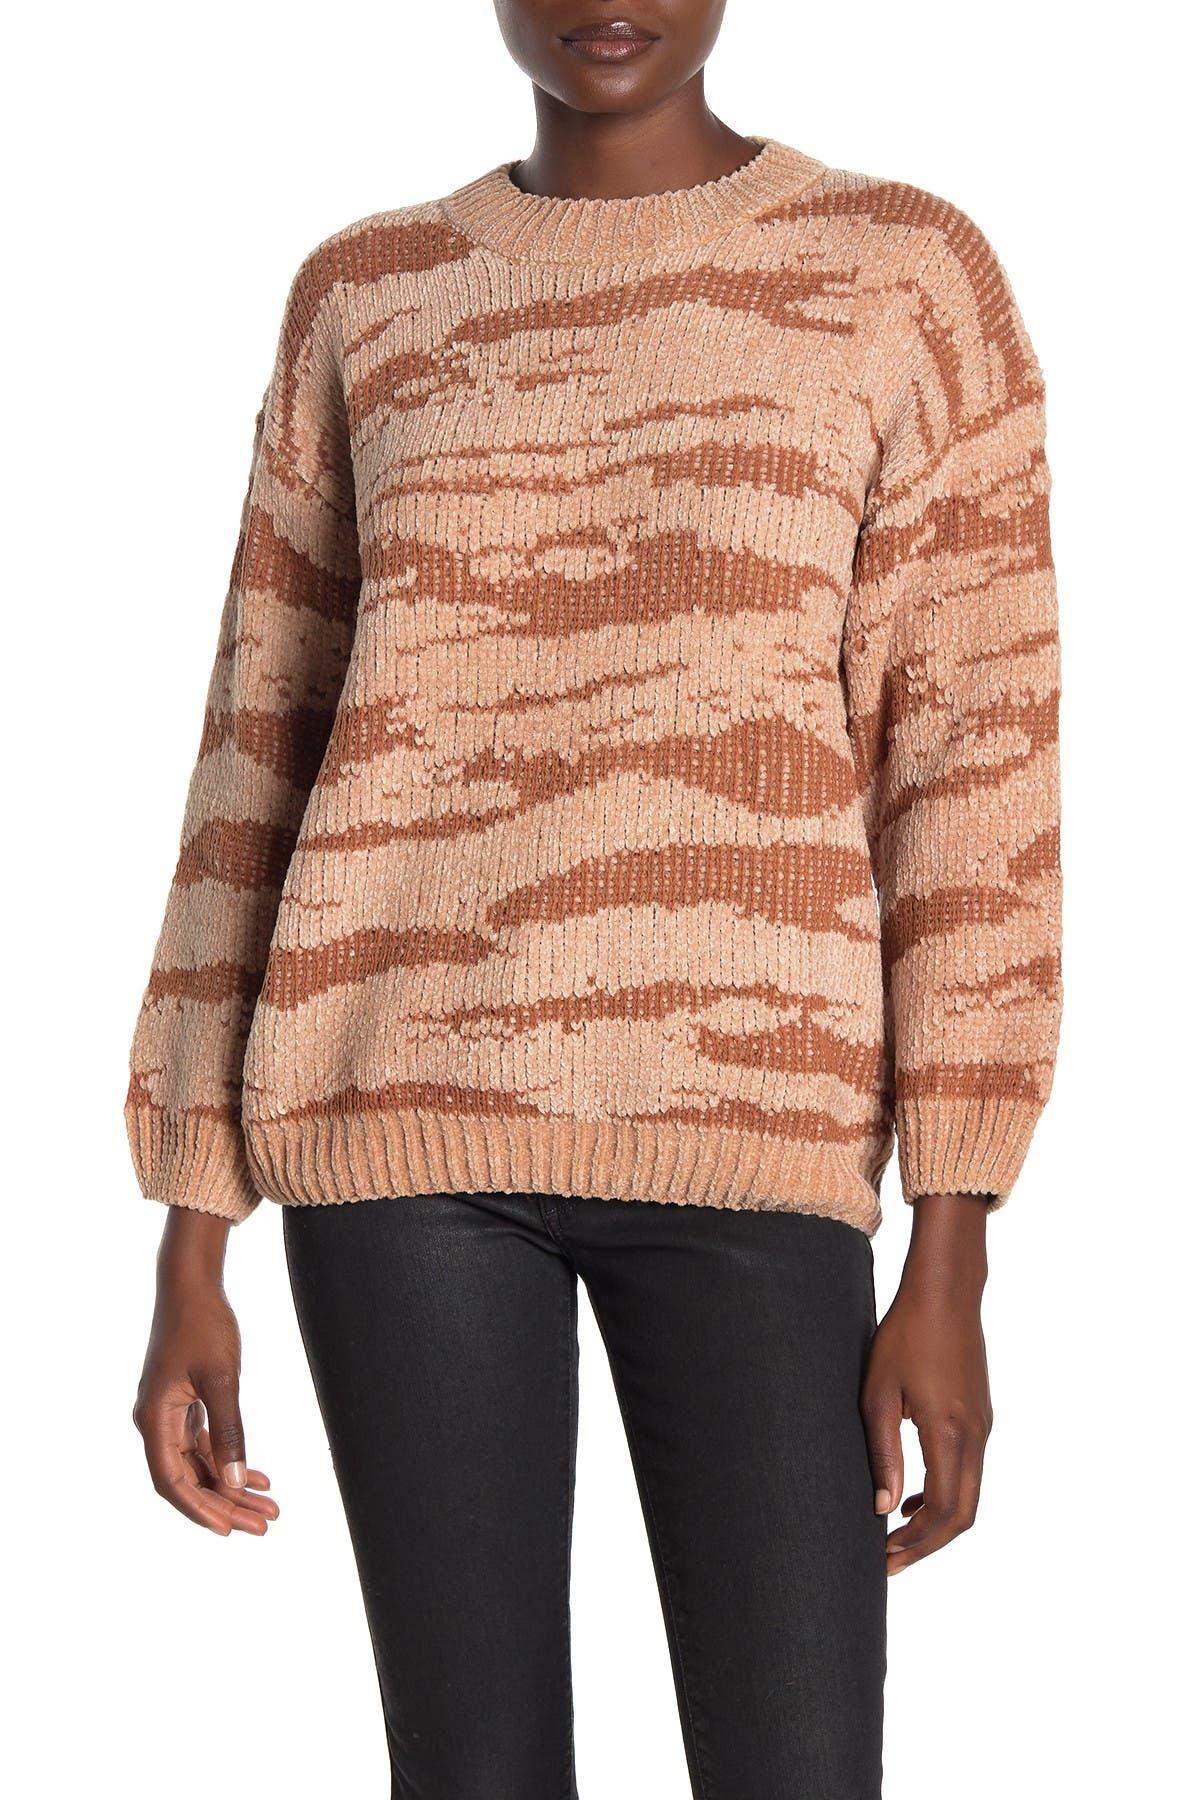 Image of Woven Heart Animal Print Crew Neck Sweater